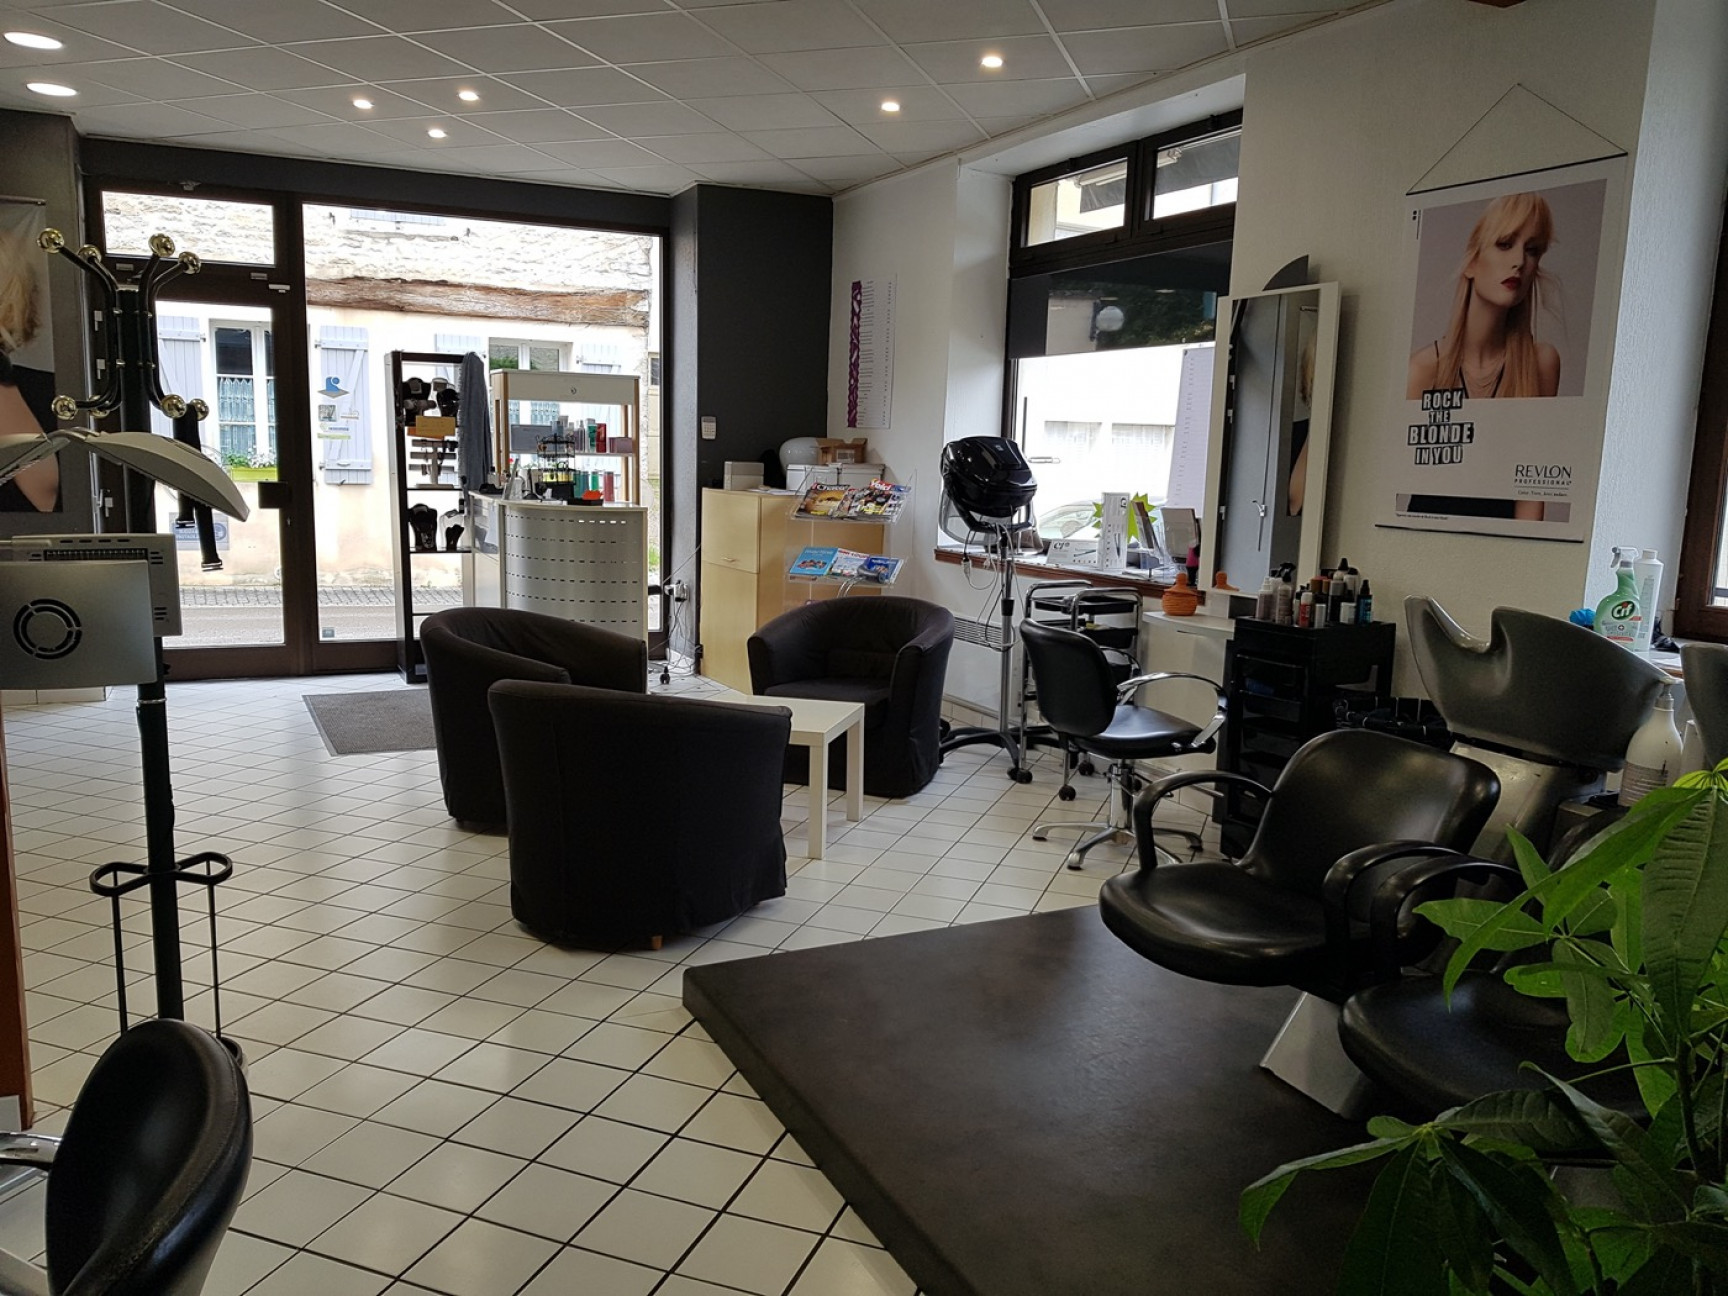 Fond de commerce de coiffure